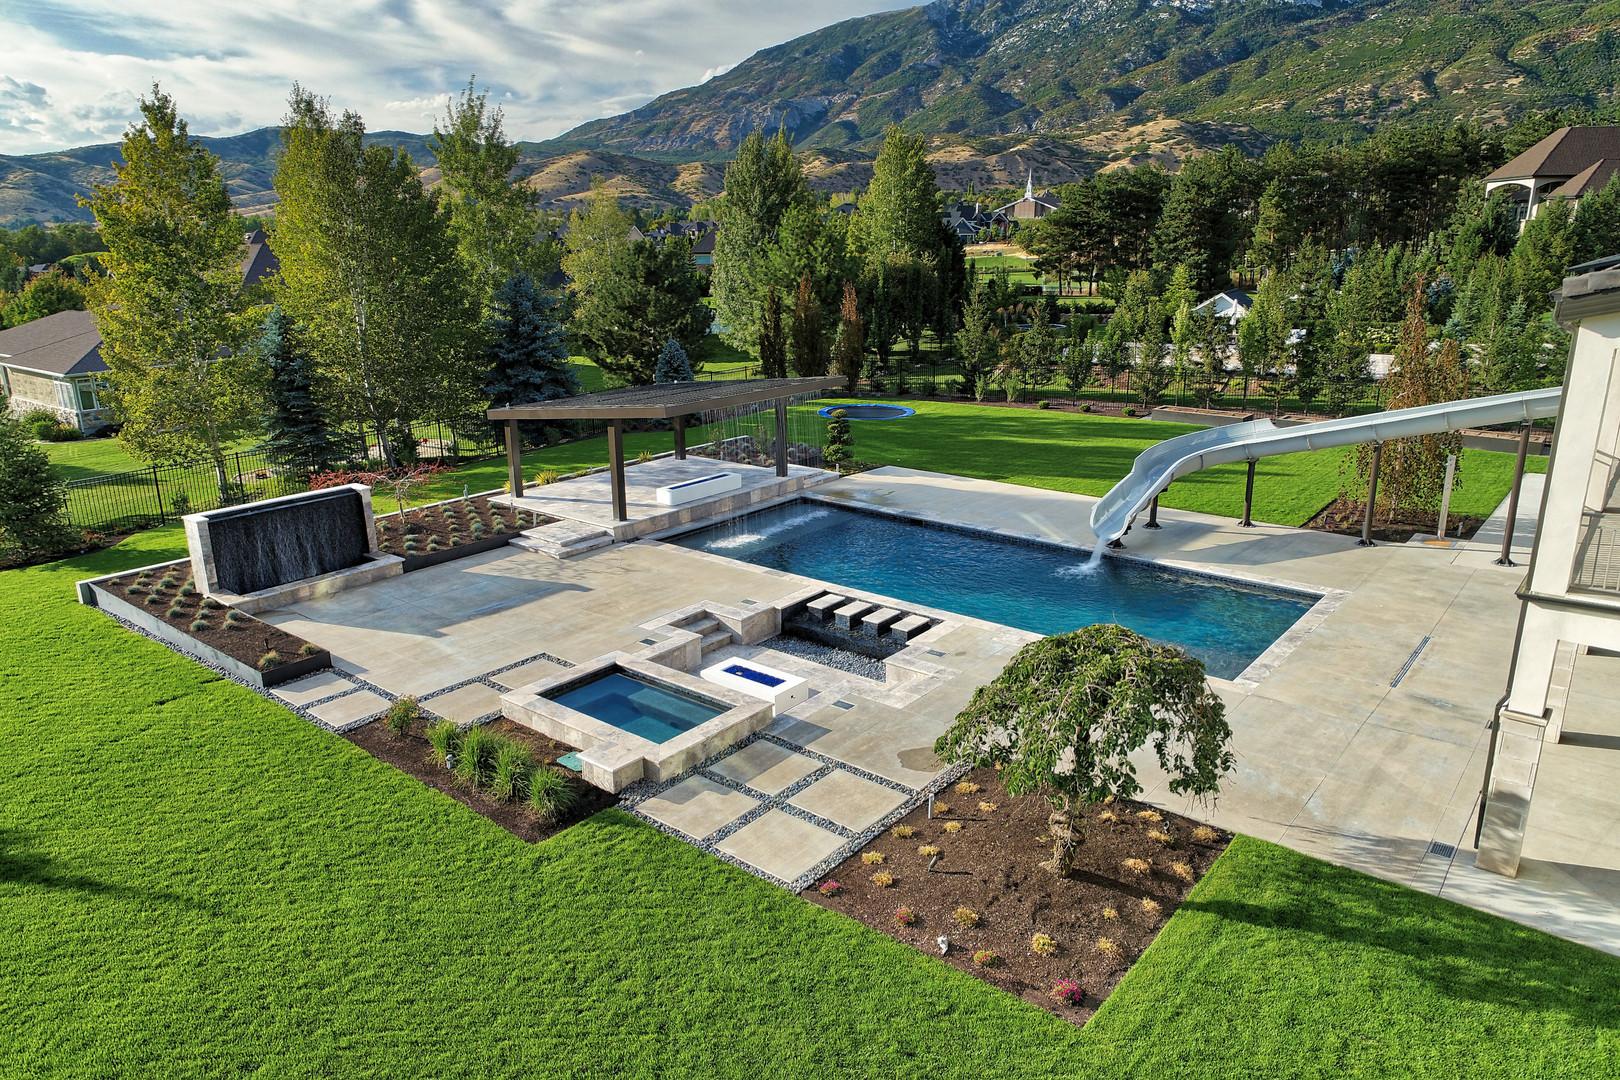 Infinity Pools LLC, New Pool, Pool Construction